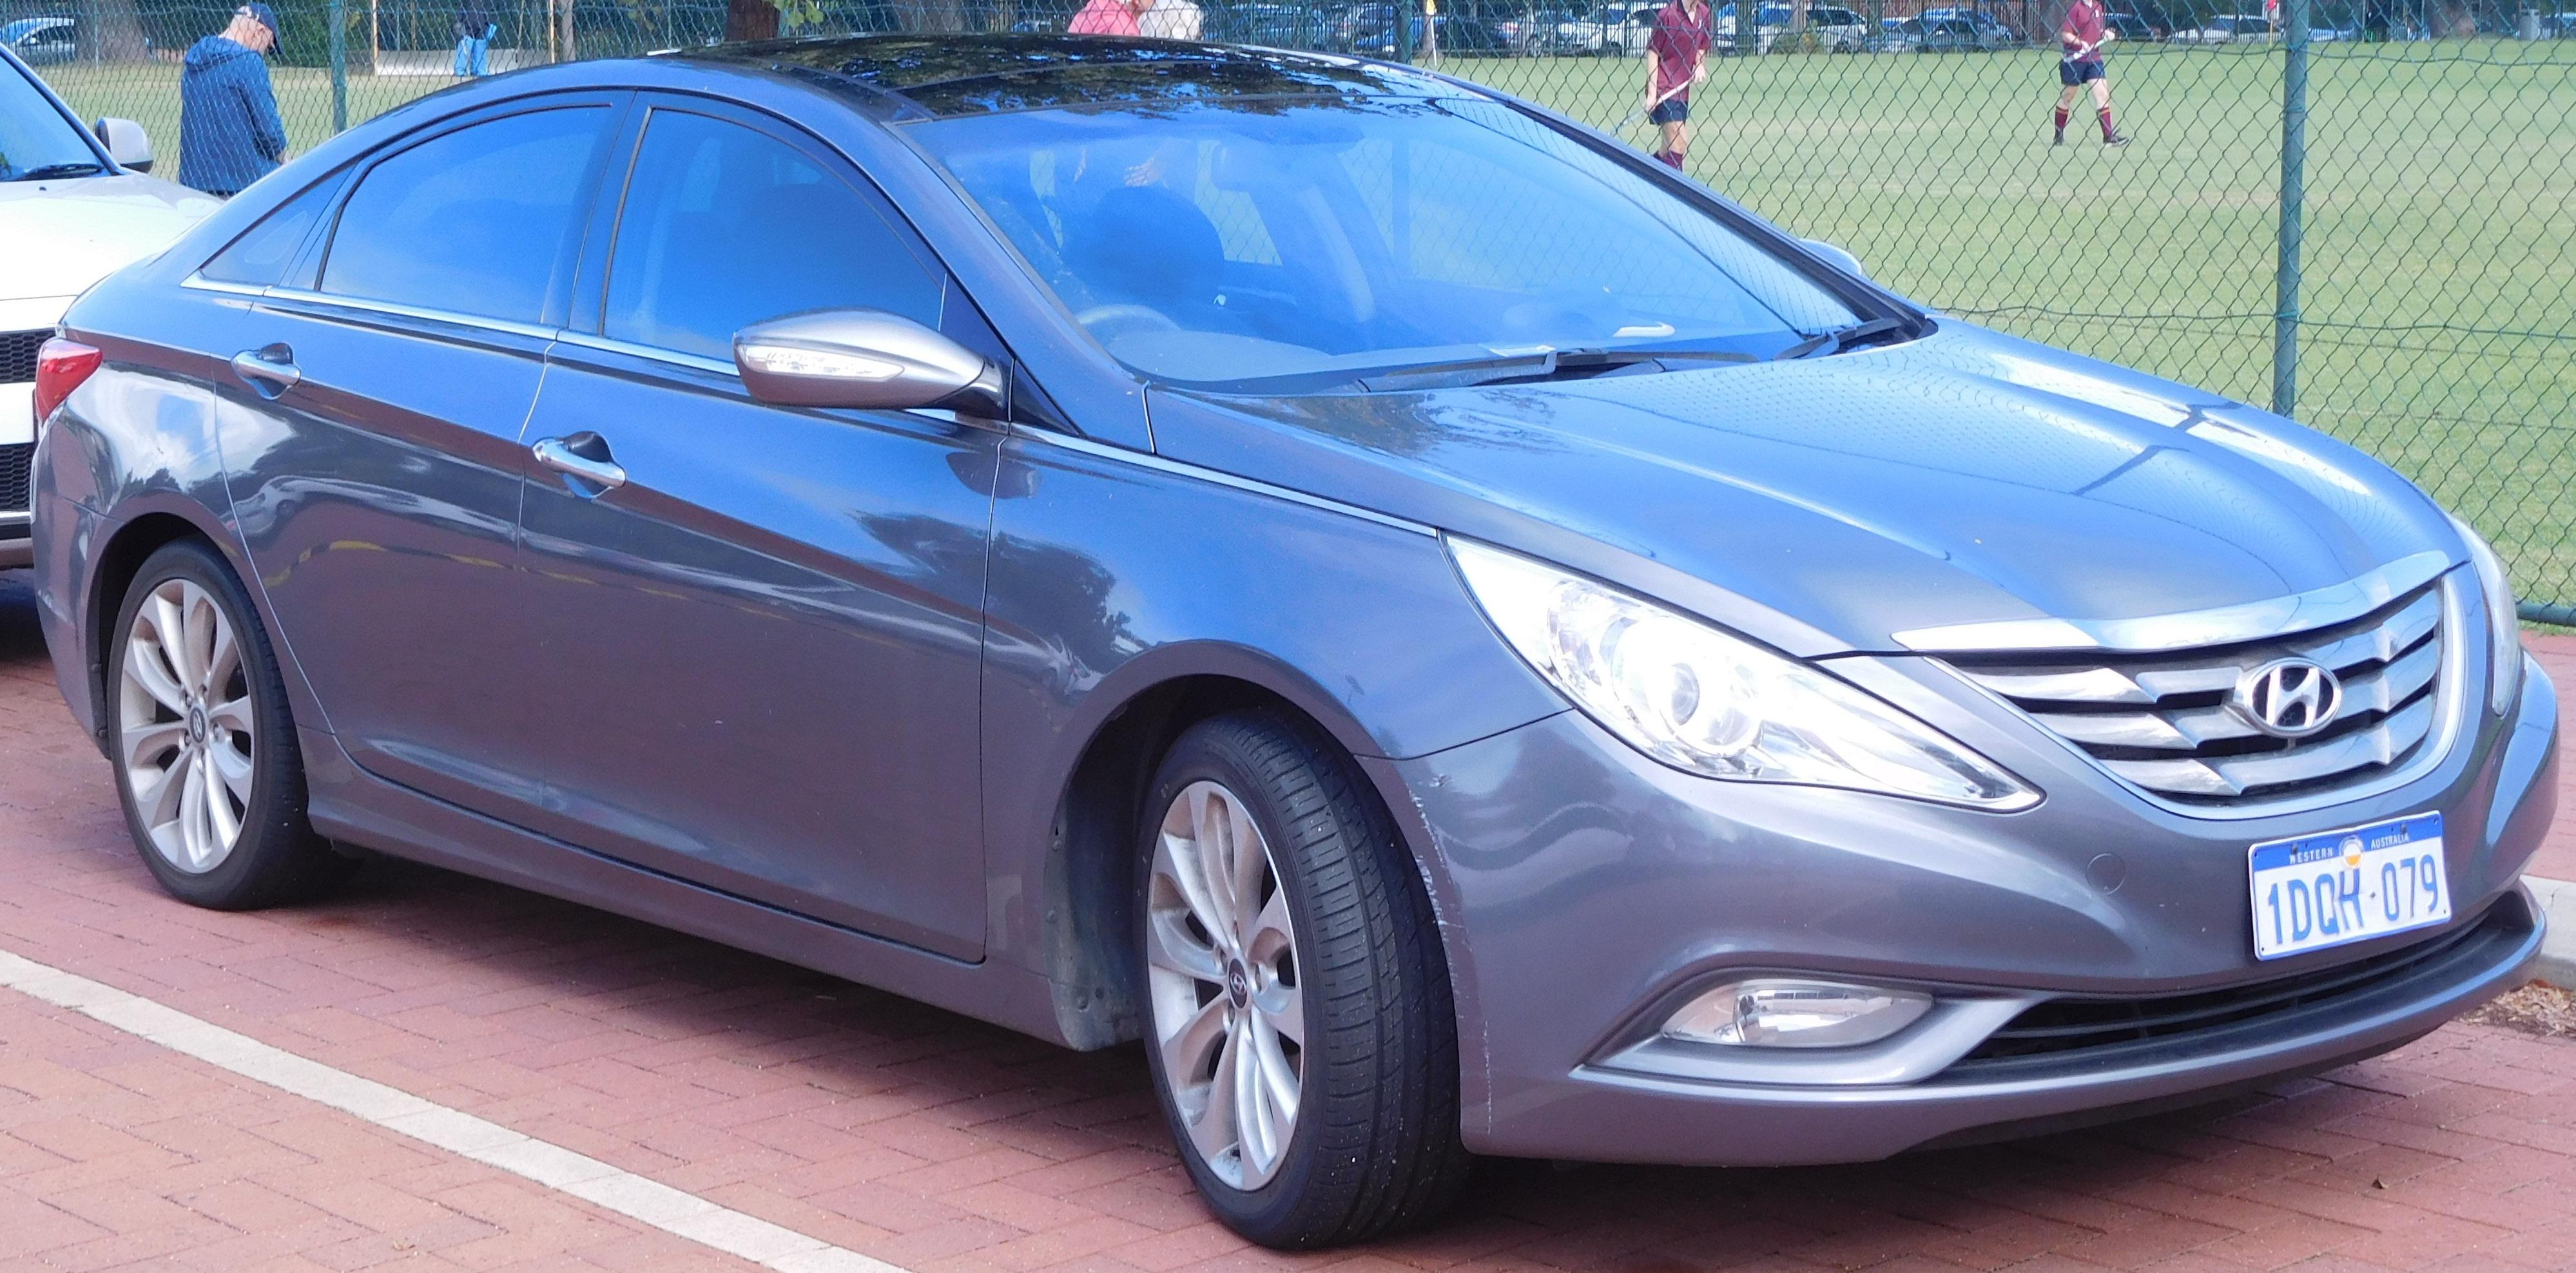 elantra and hyundai photos led brings features classy updates pricing tech sedan